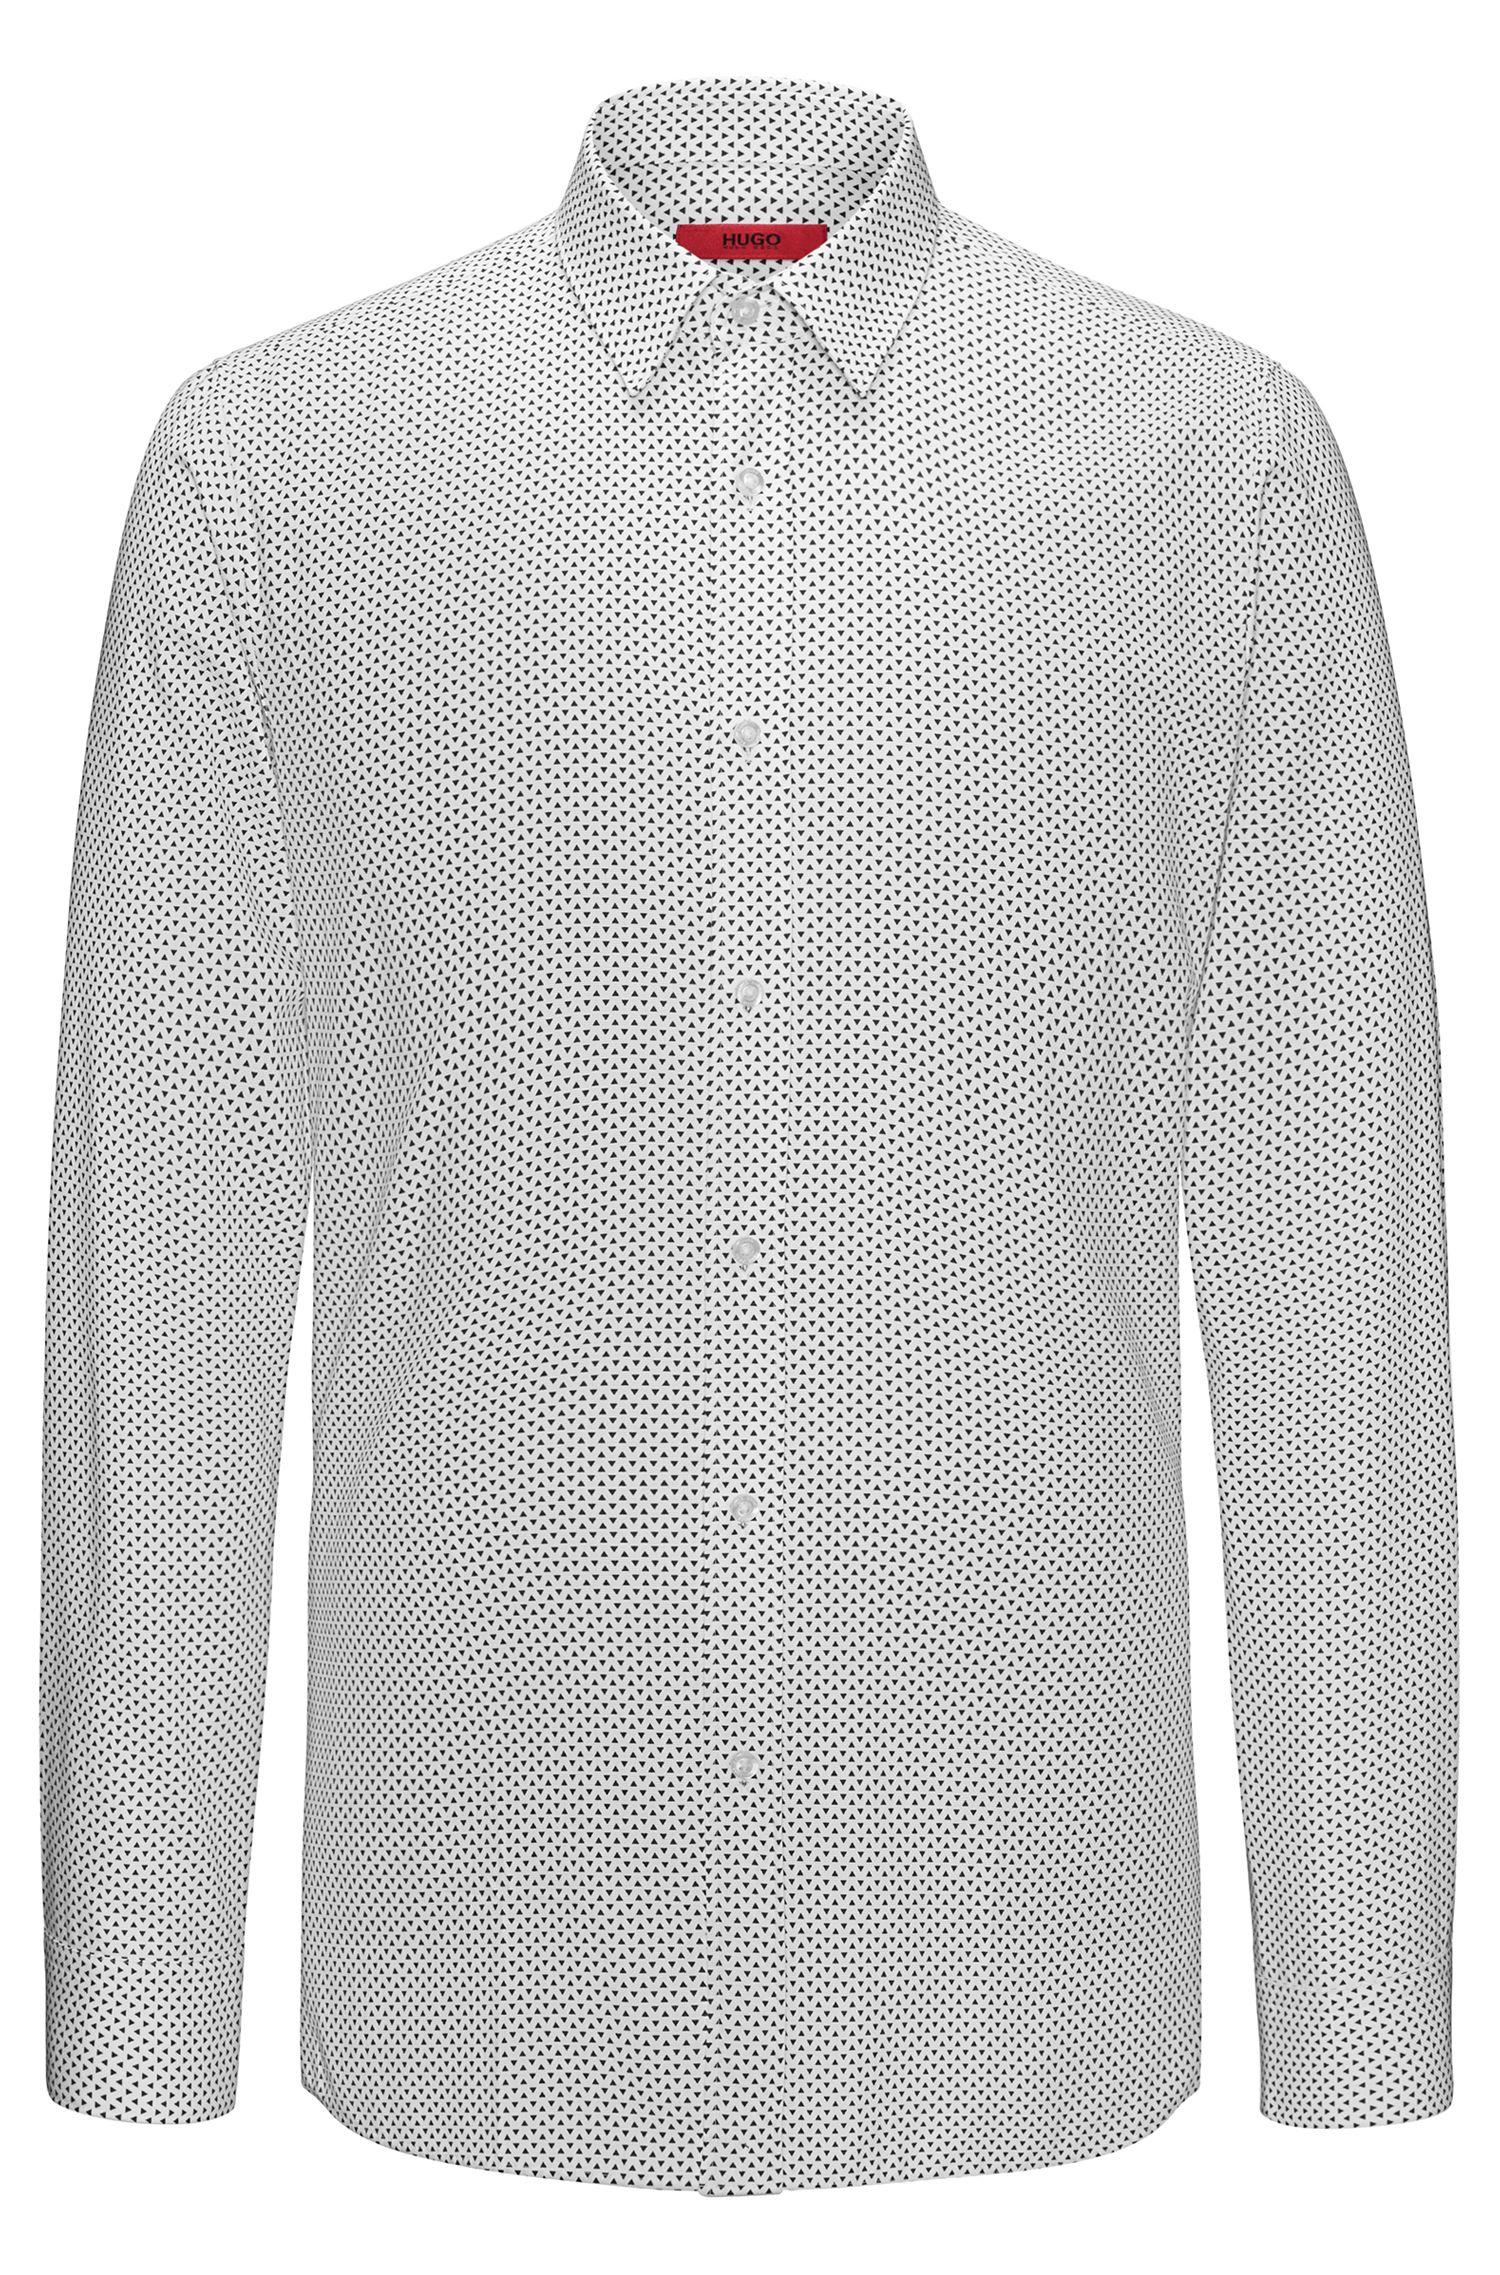 Triangle-Print Cotton Sport Shirt, Extra Slim Fit   Elisha